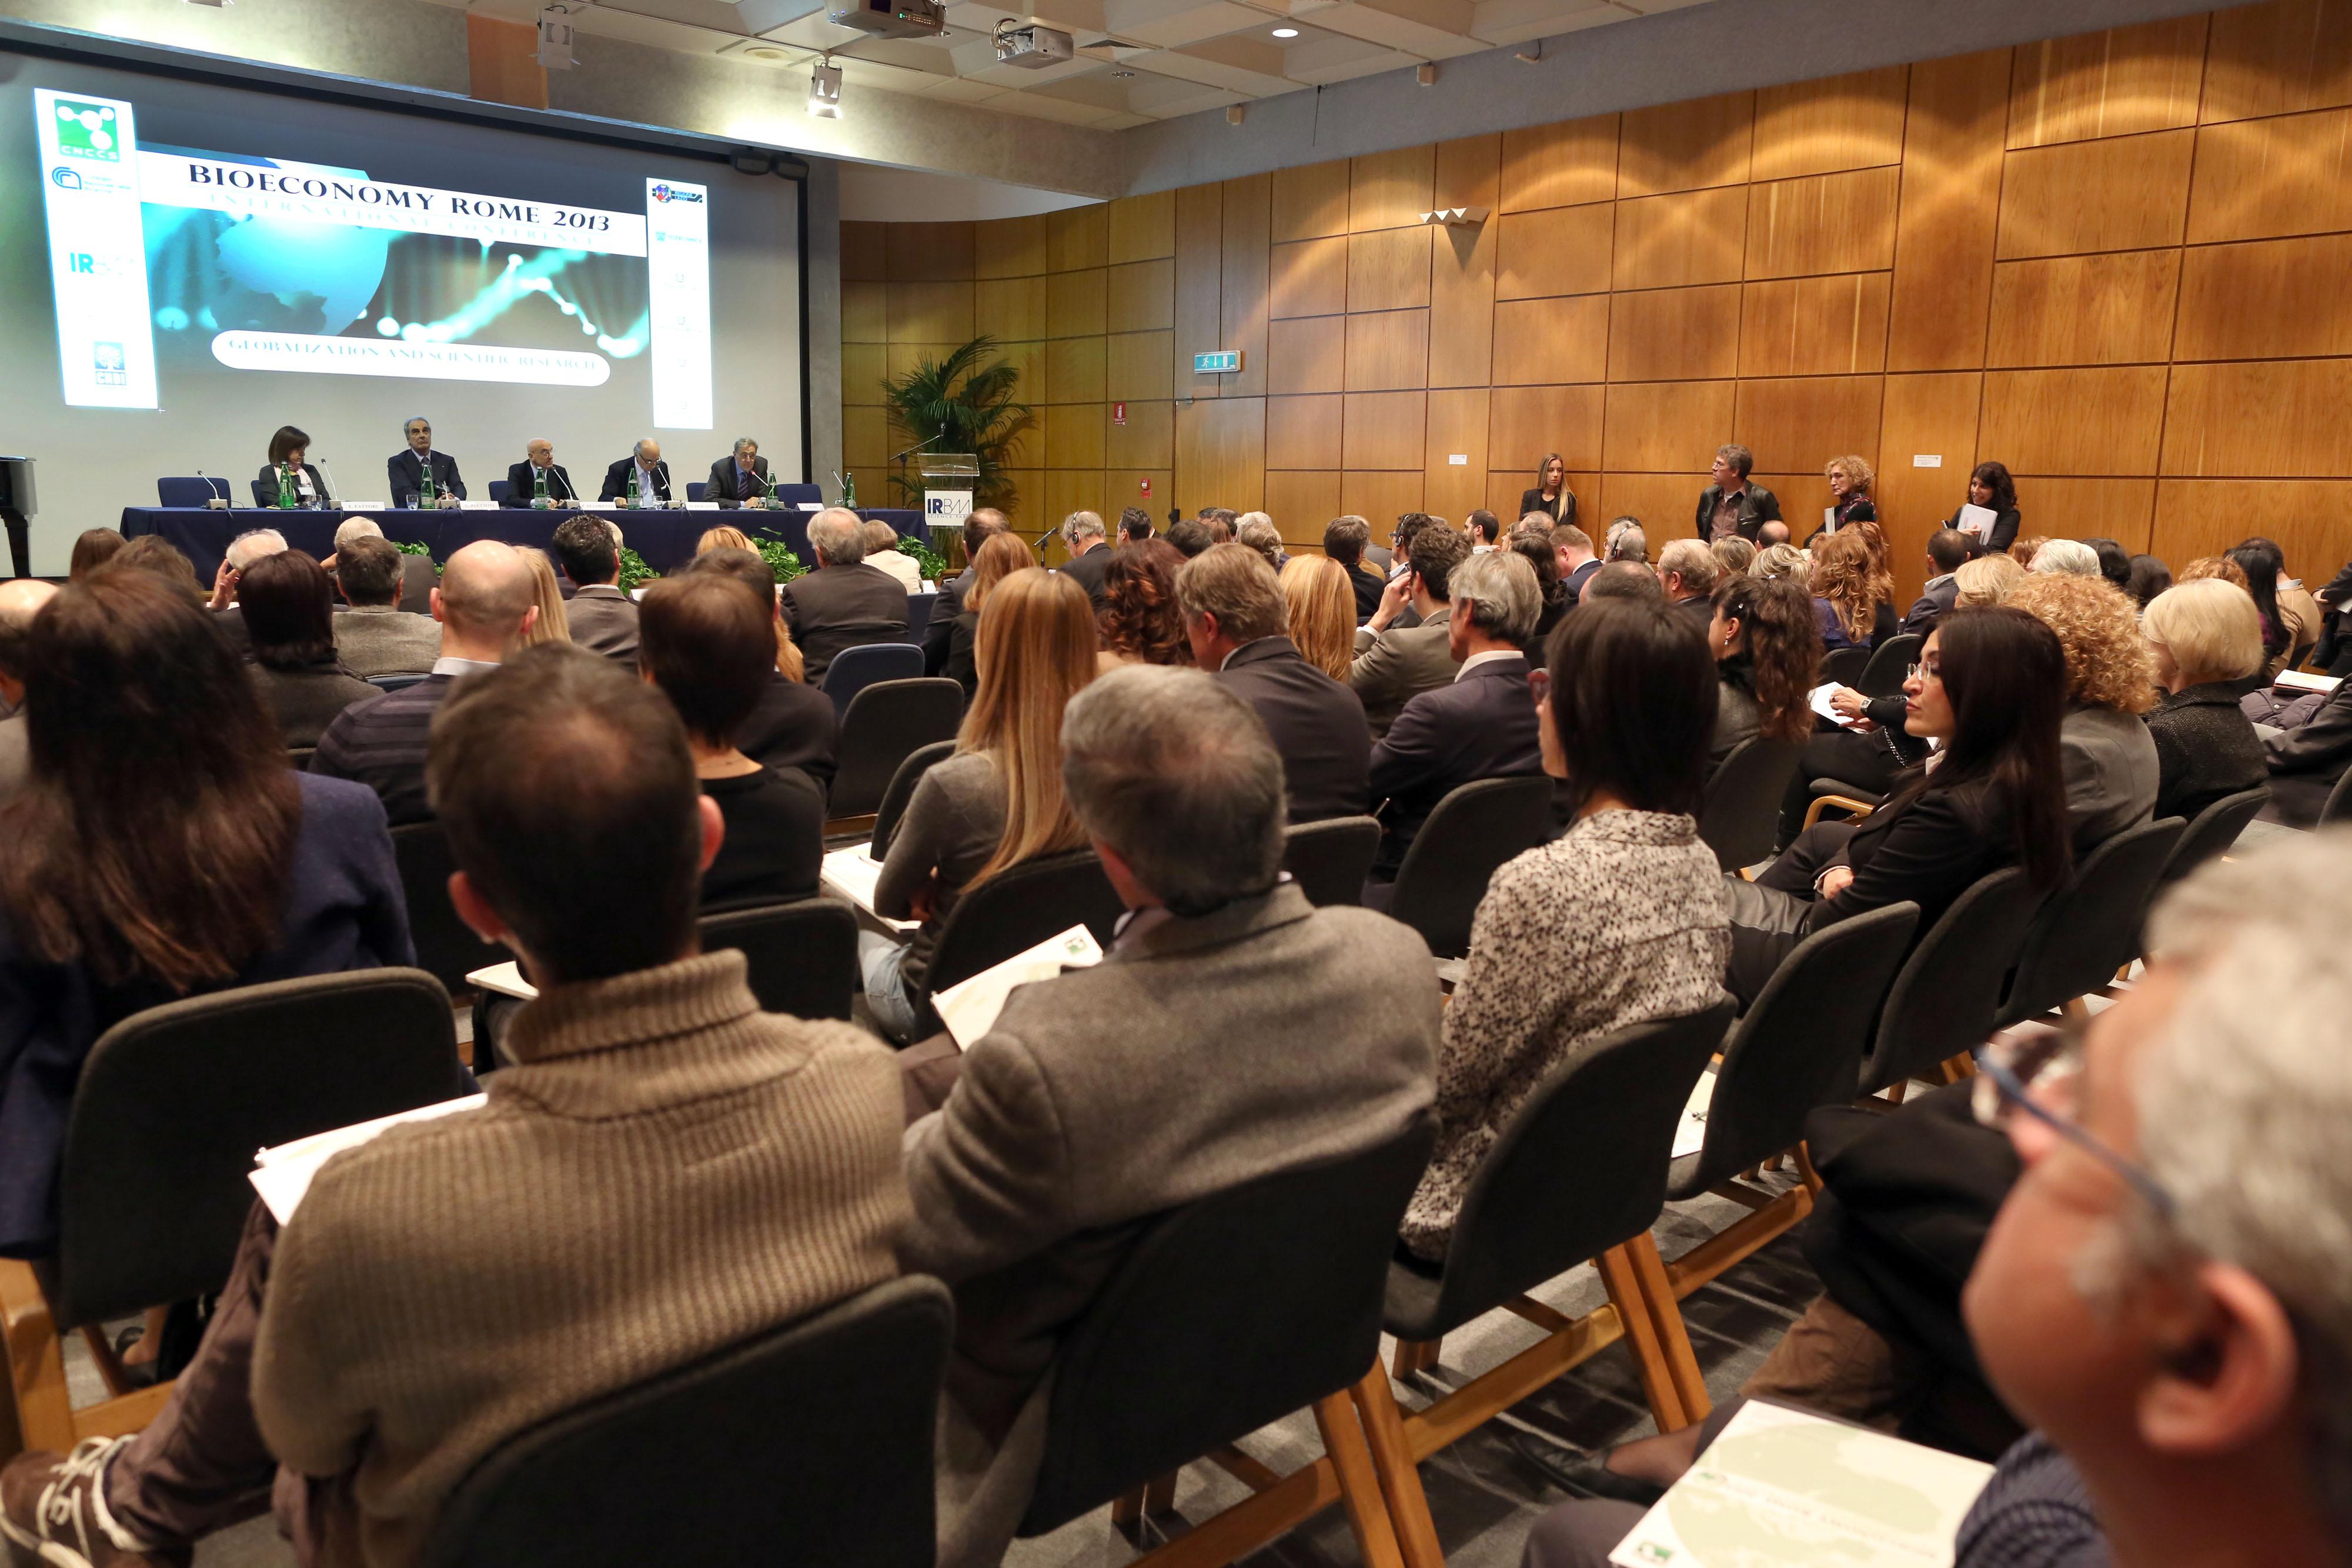 Bioeconomy Rome 2013 cnccs irbm